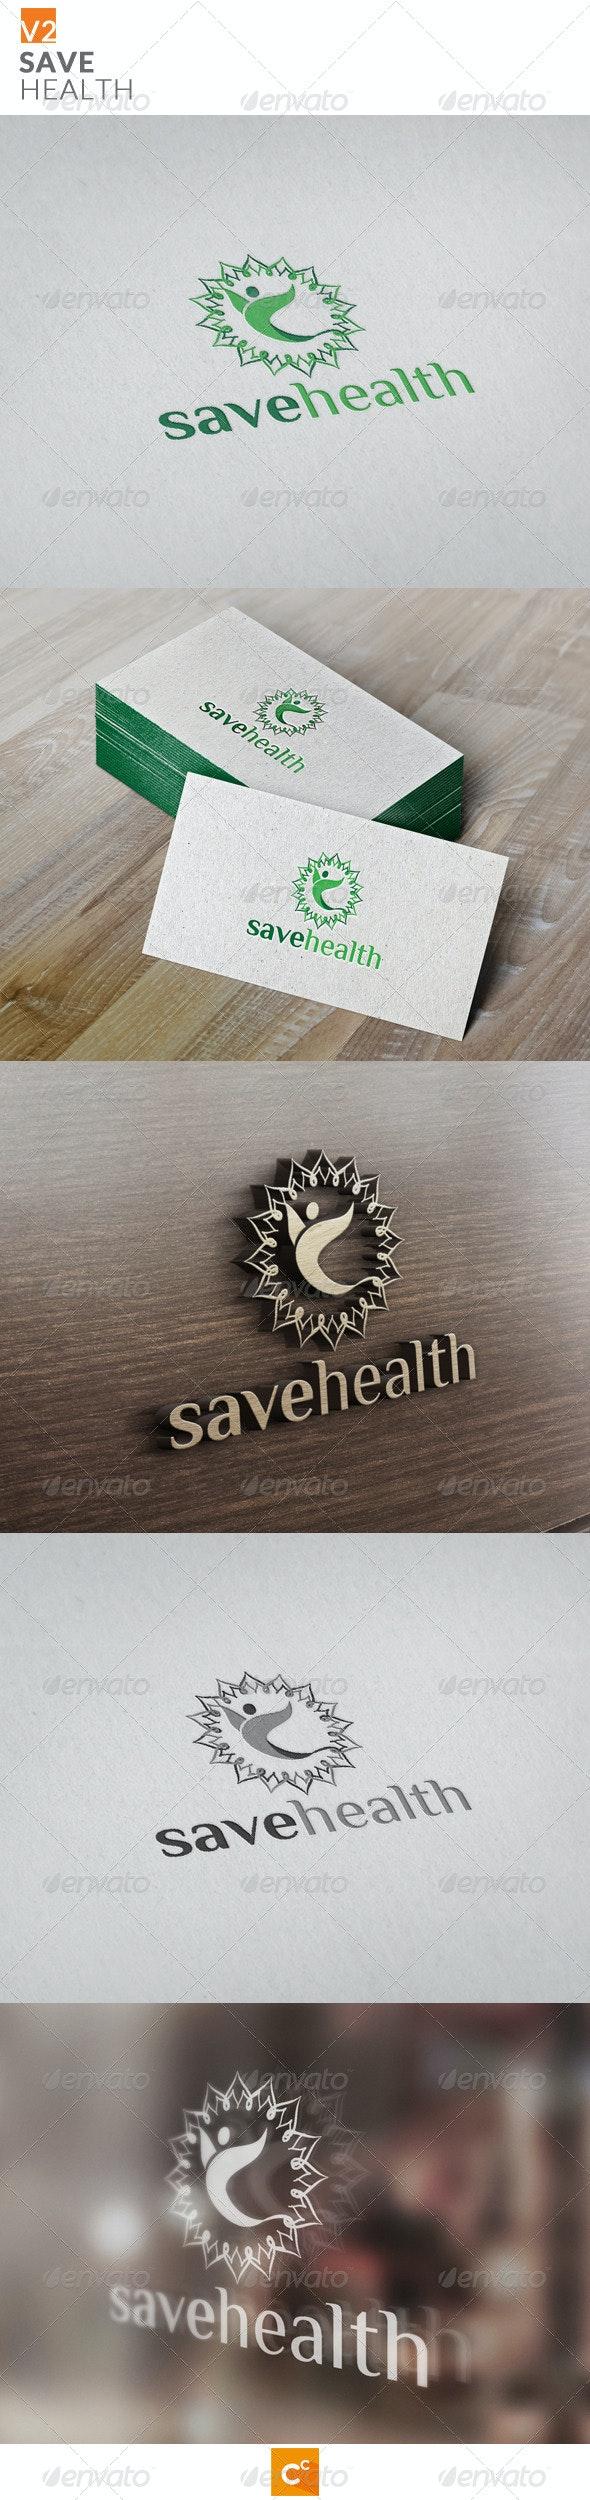 Save Health v2 - Symbols Logo Templates